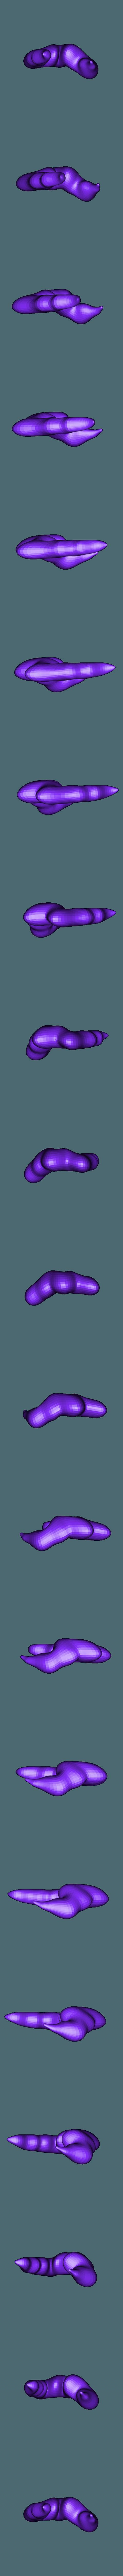 Cura Celestia queue.stl Download free STL file MLP Pony Celestia • Design to 3D print, arcandg